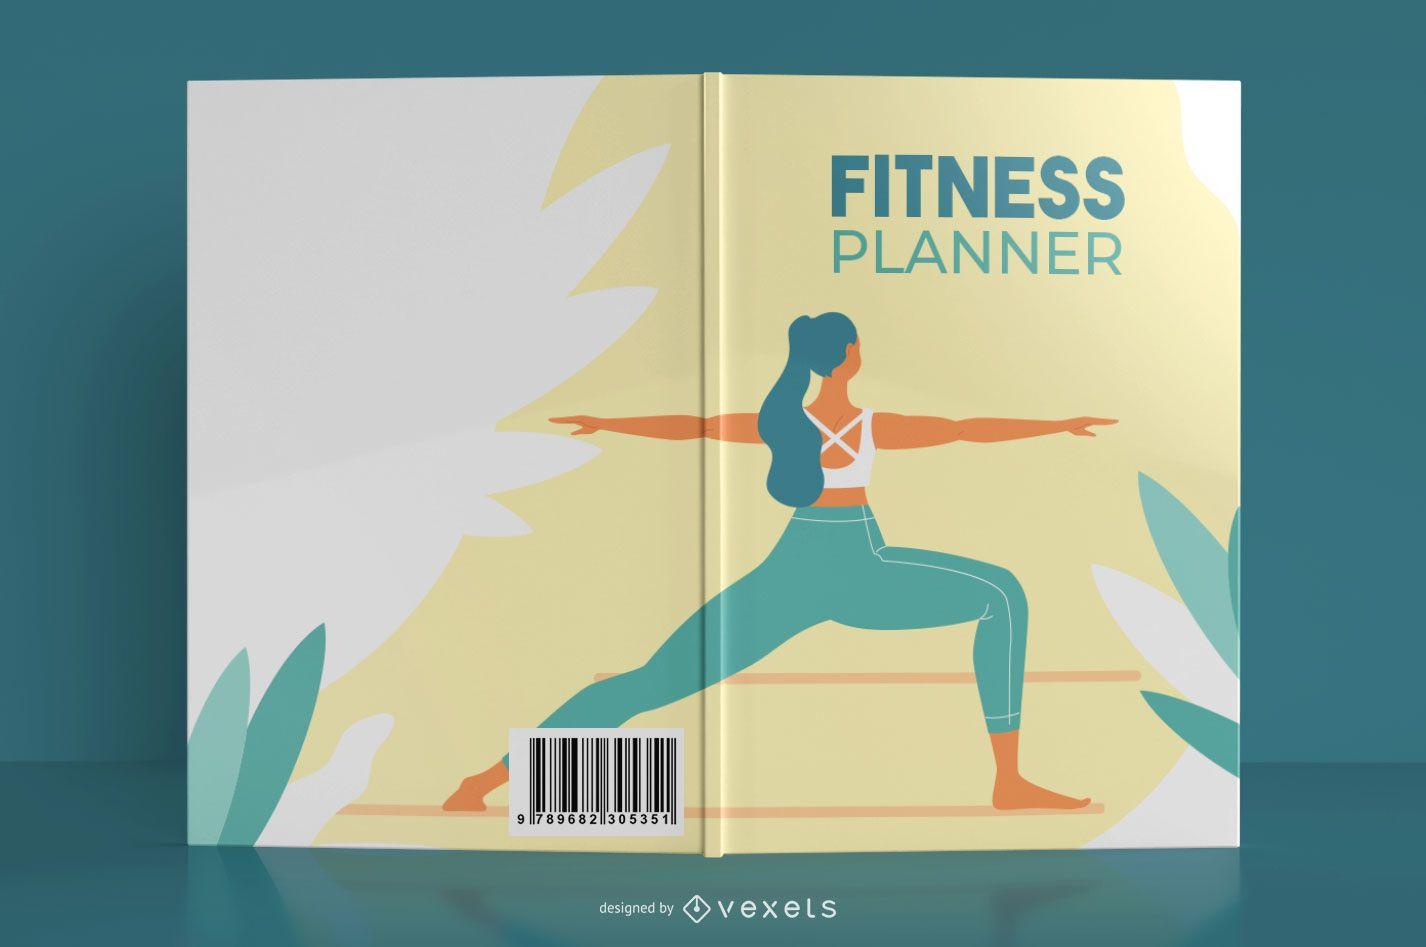 Yoga fitness planner book cover design